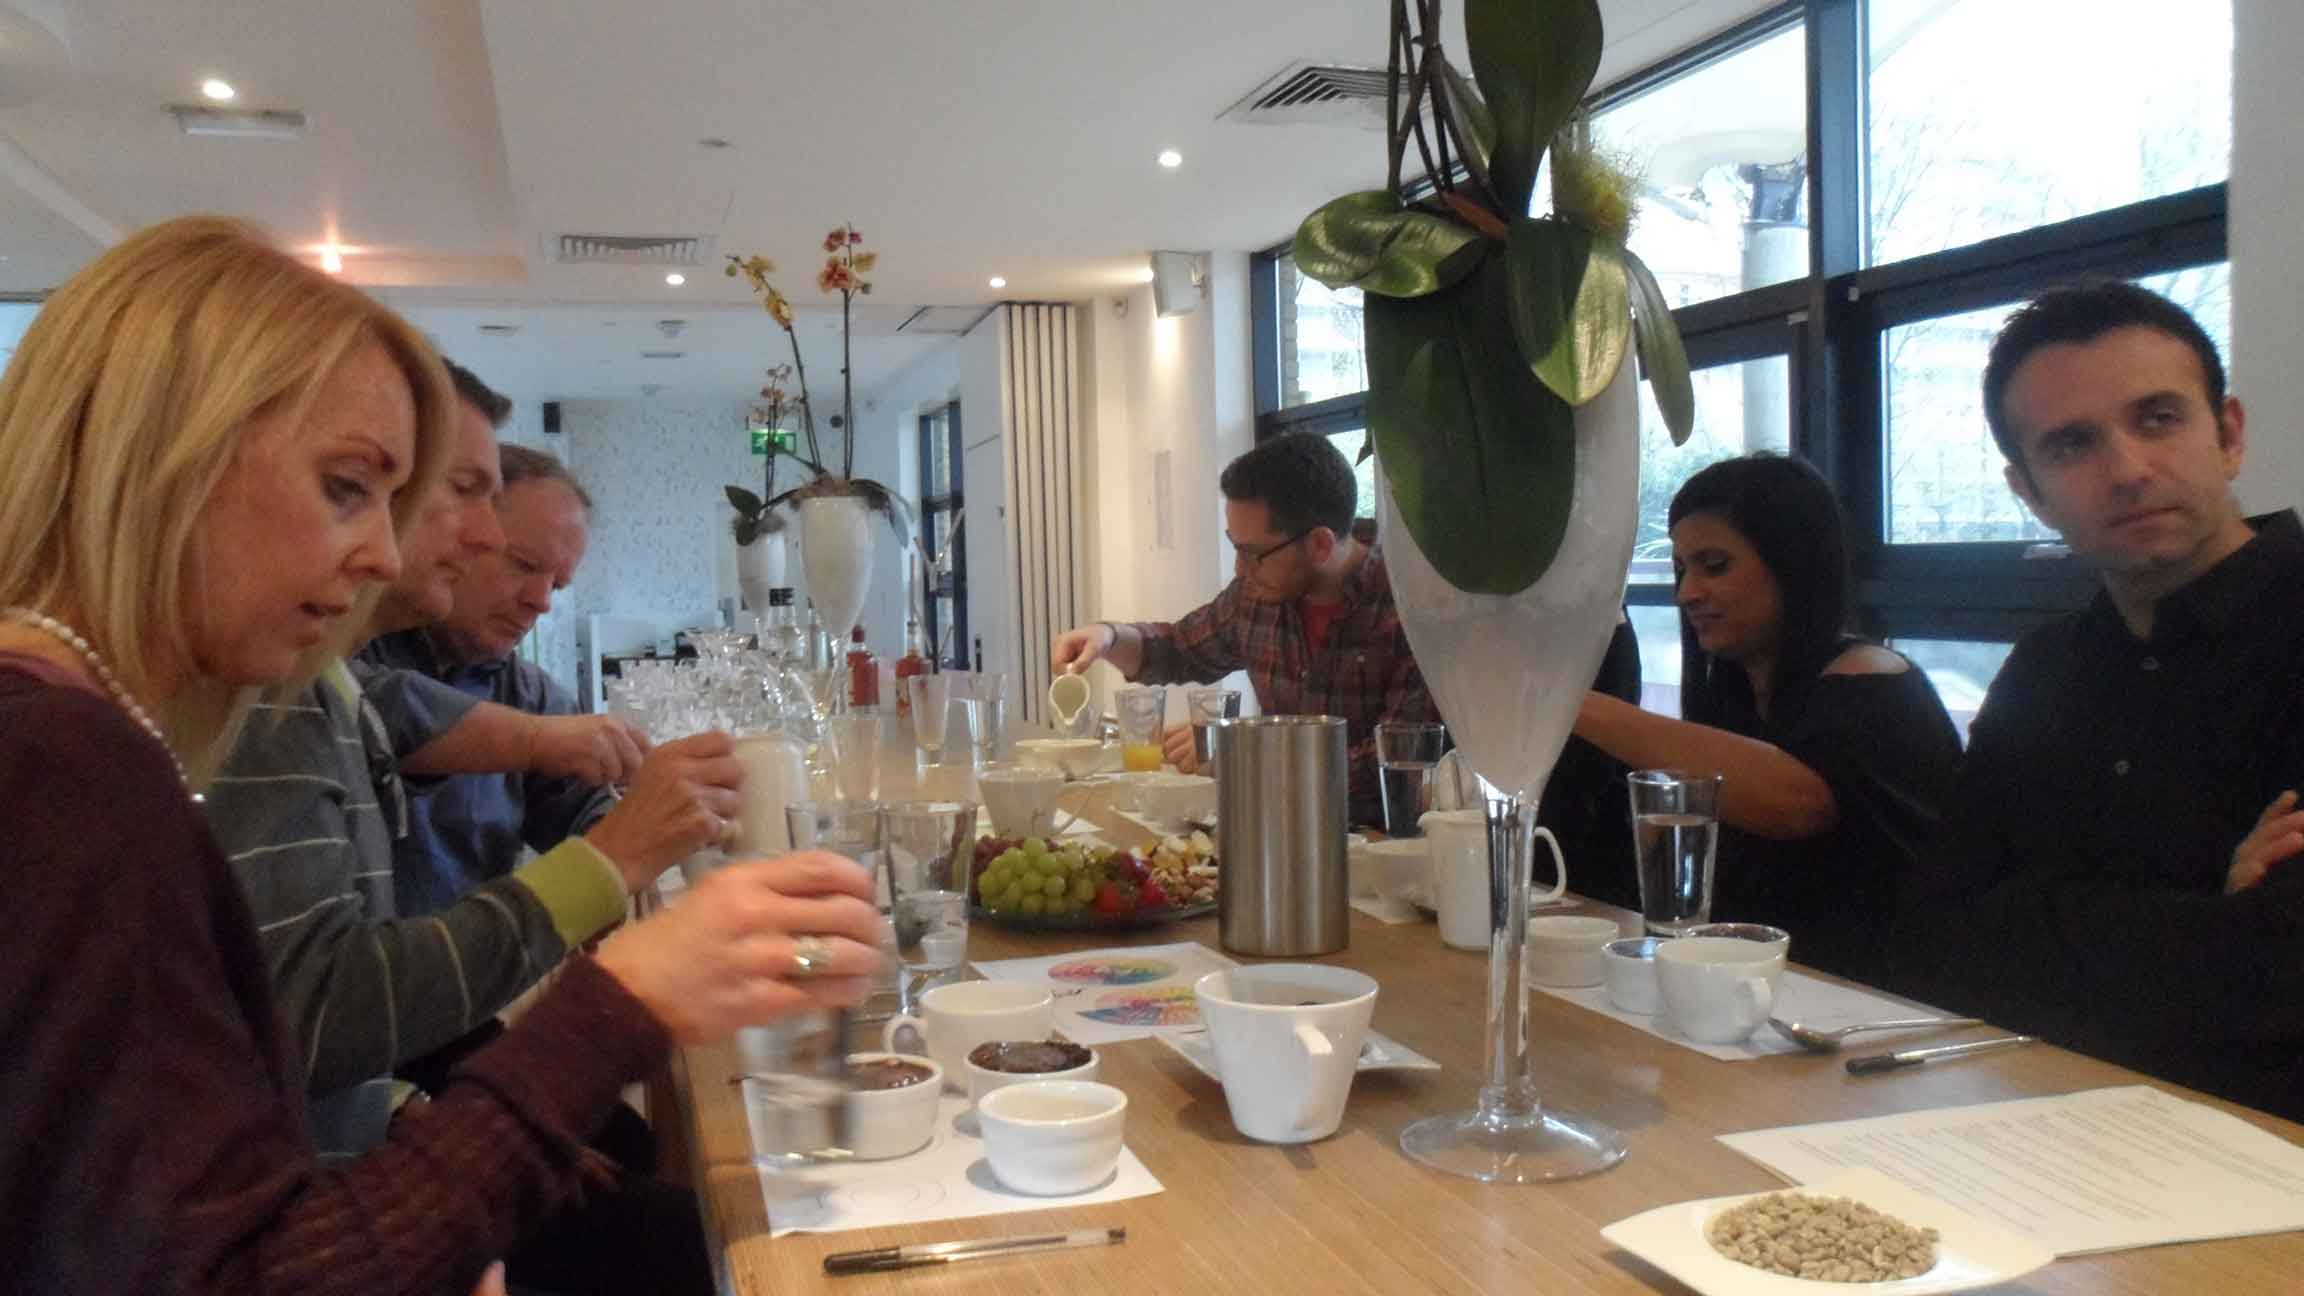 rumtasting-coffeetasting-london